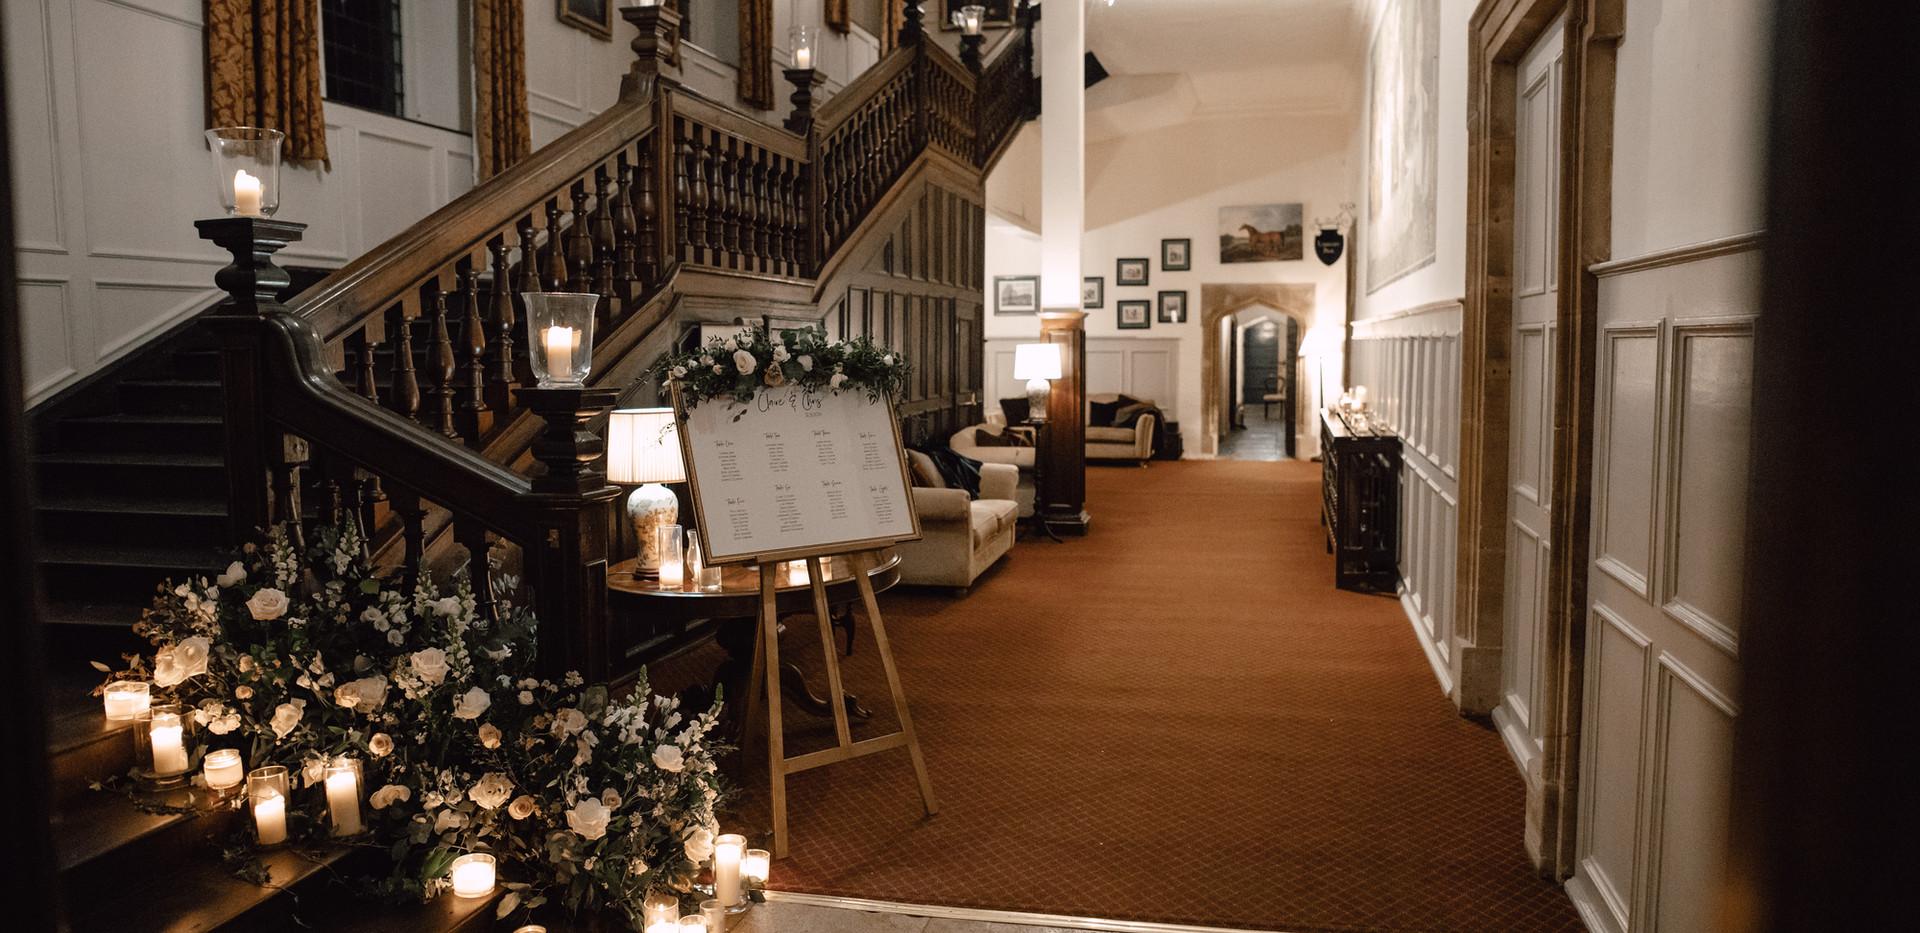 Brympton-House-Wedding-The-Saums-CC-D-21